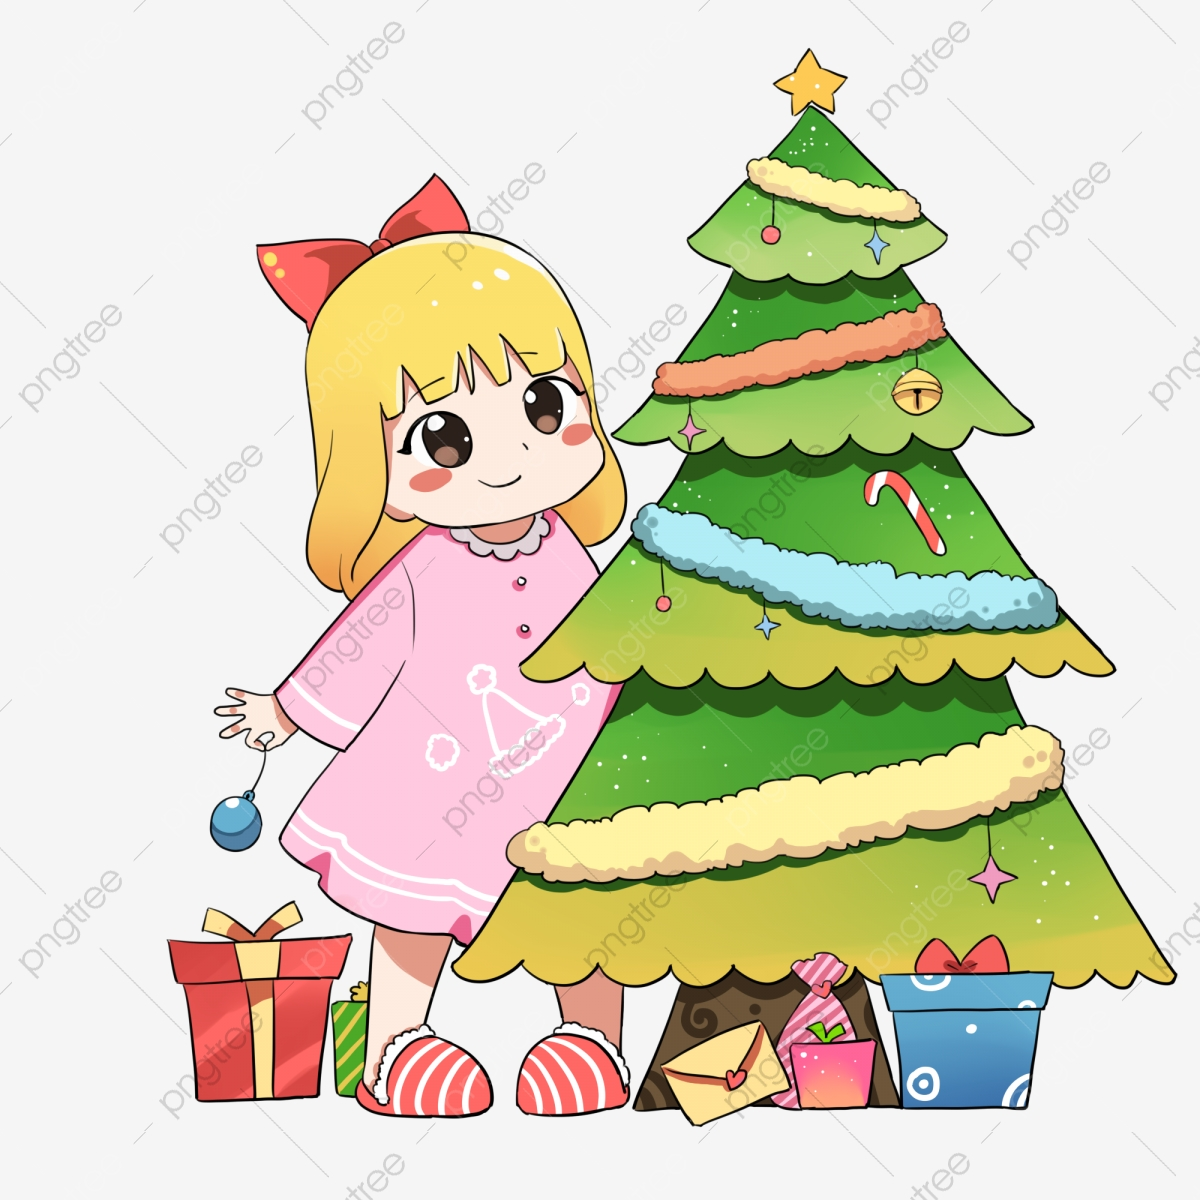 Dibujos Animados De Navidad Niña De Dibujos Animados Decorar